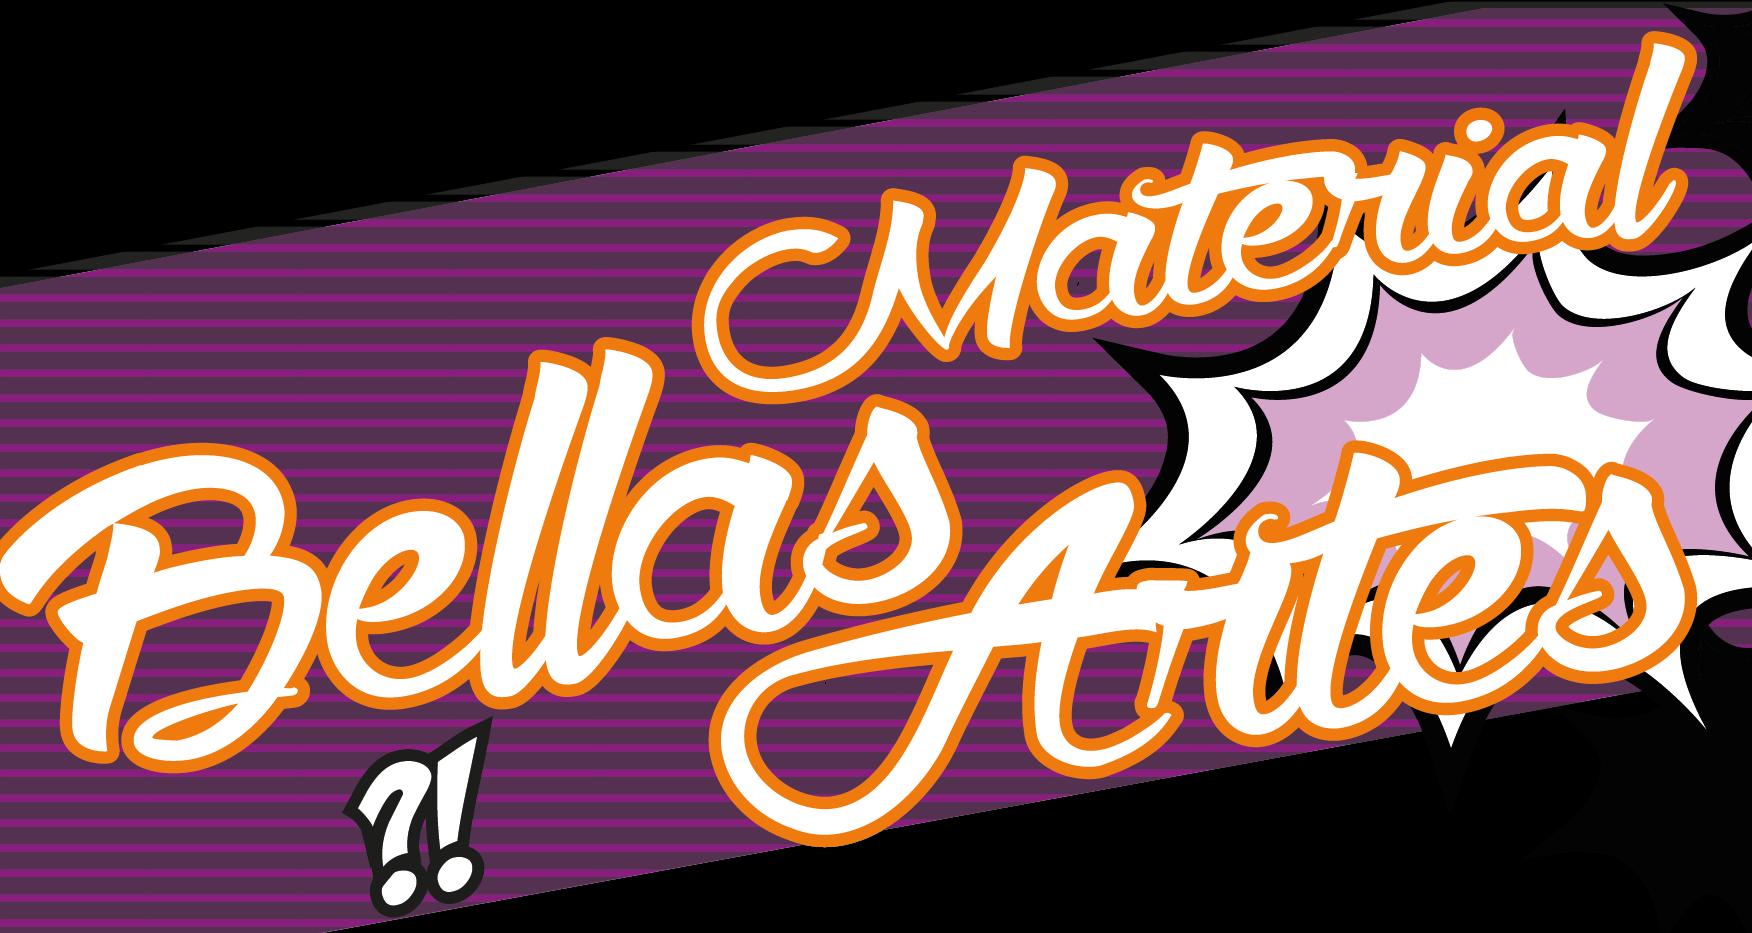 Material Bellas Artes